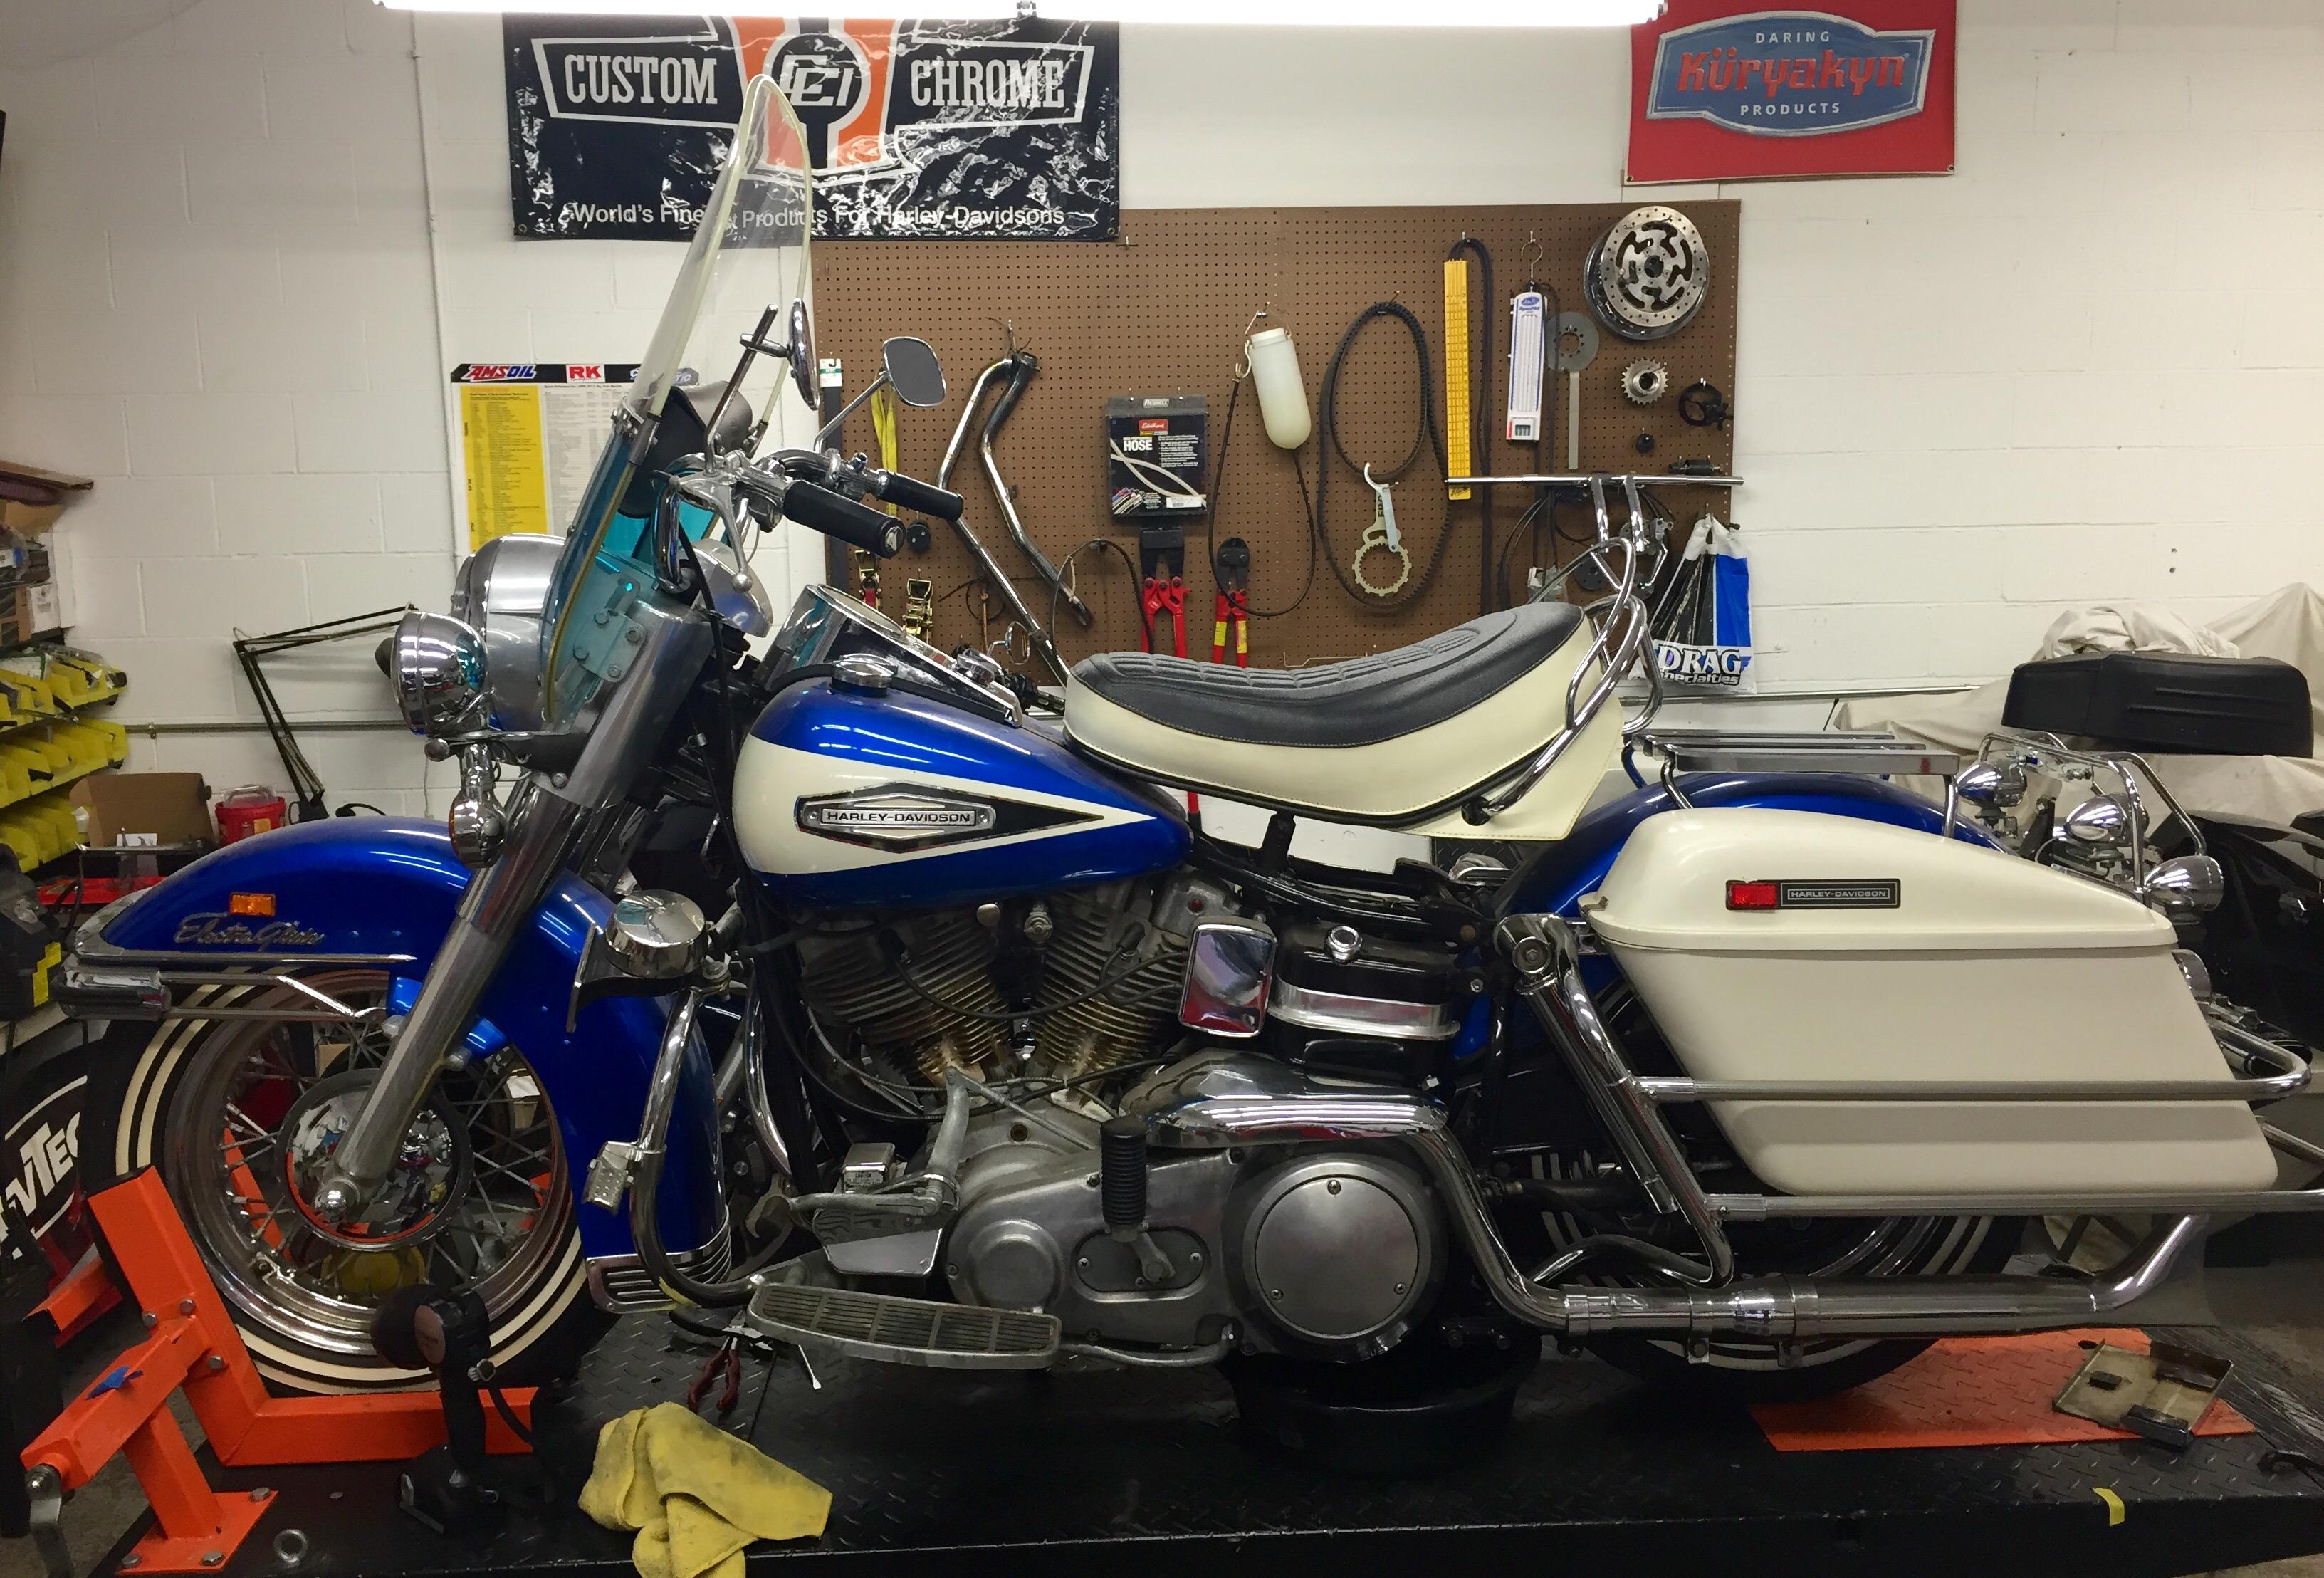 1970 Harley Davidson Electra Glide